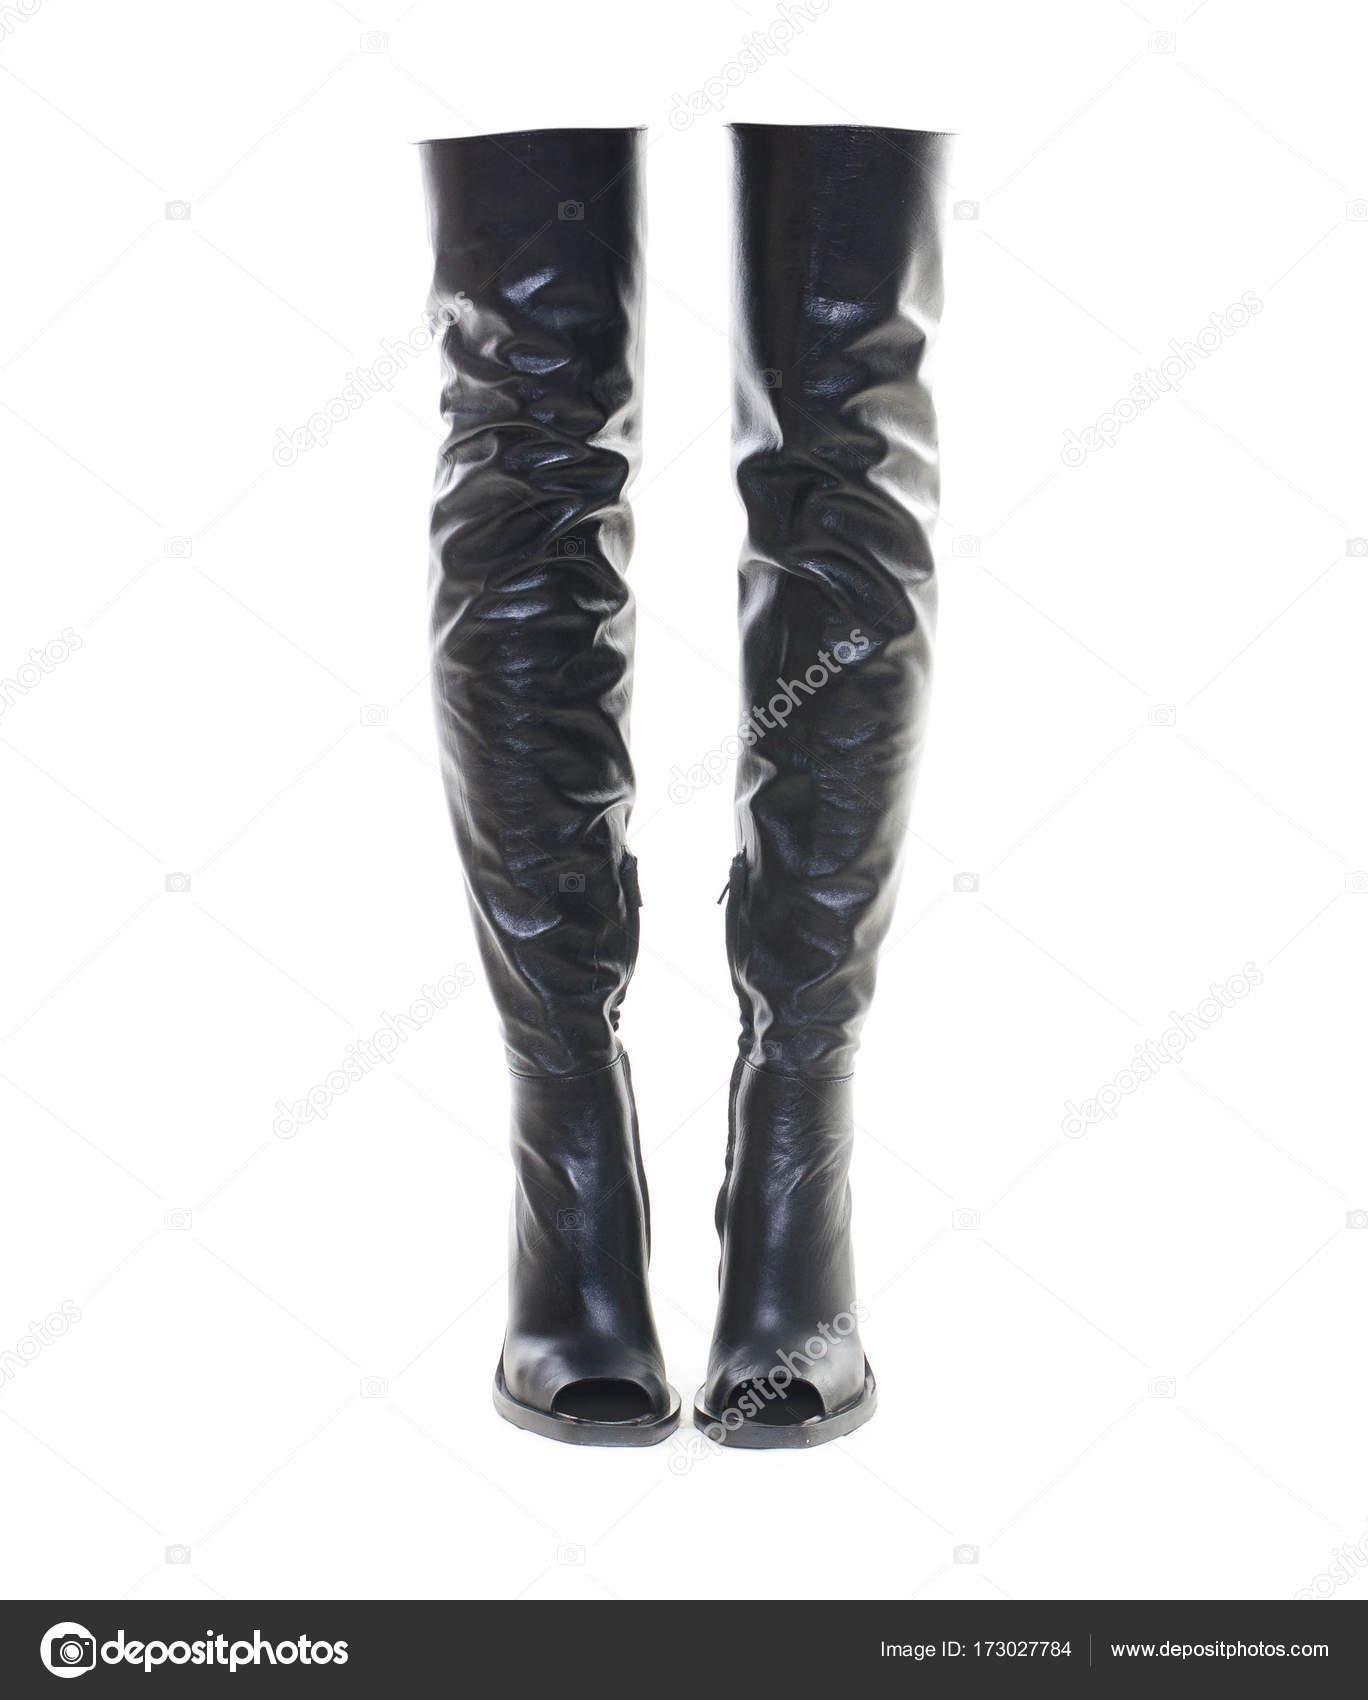 Фото женские ножки в сапогах фетиш порно